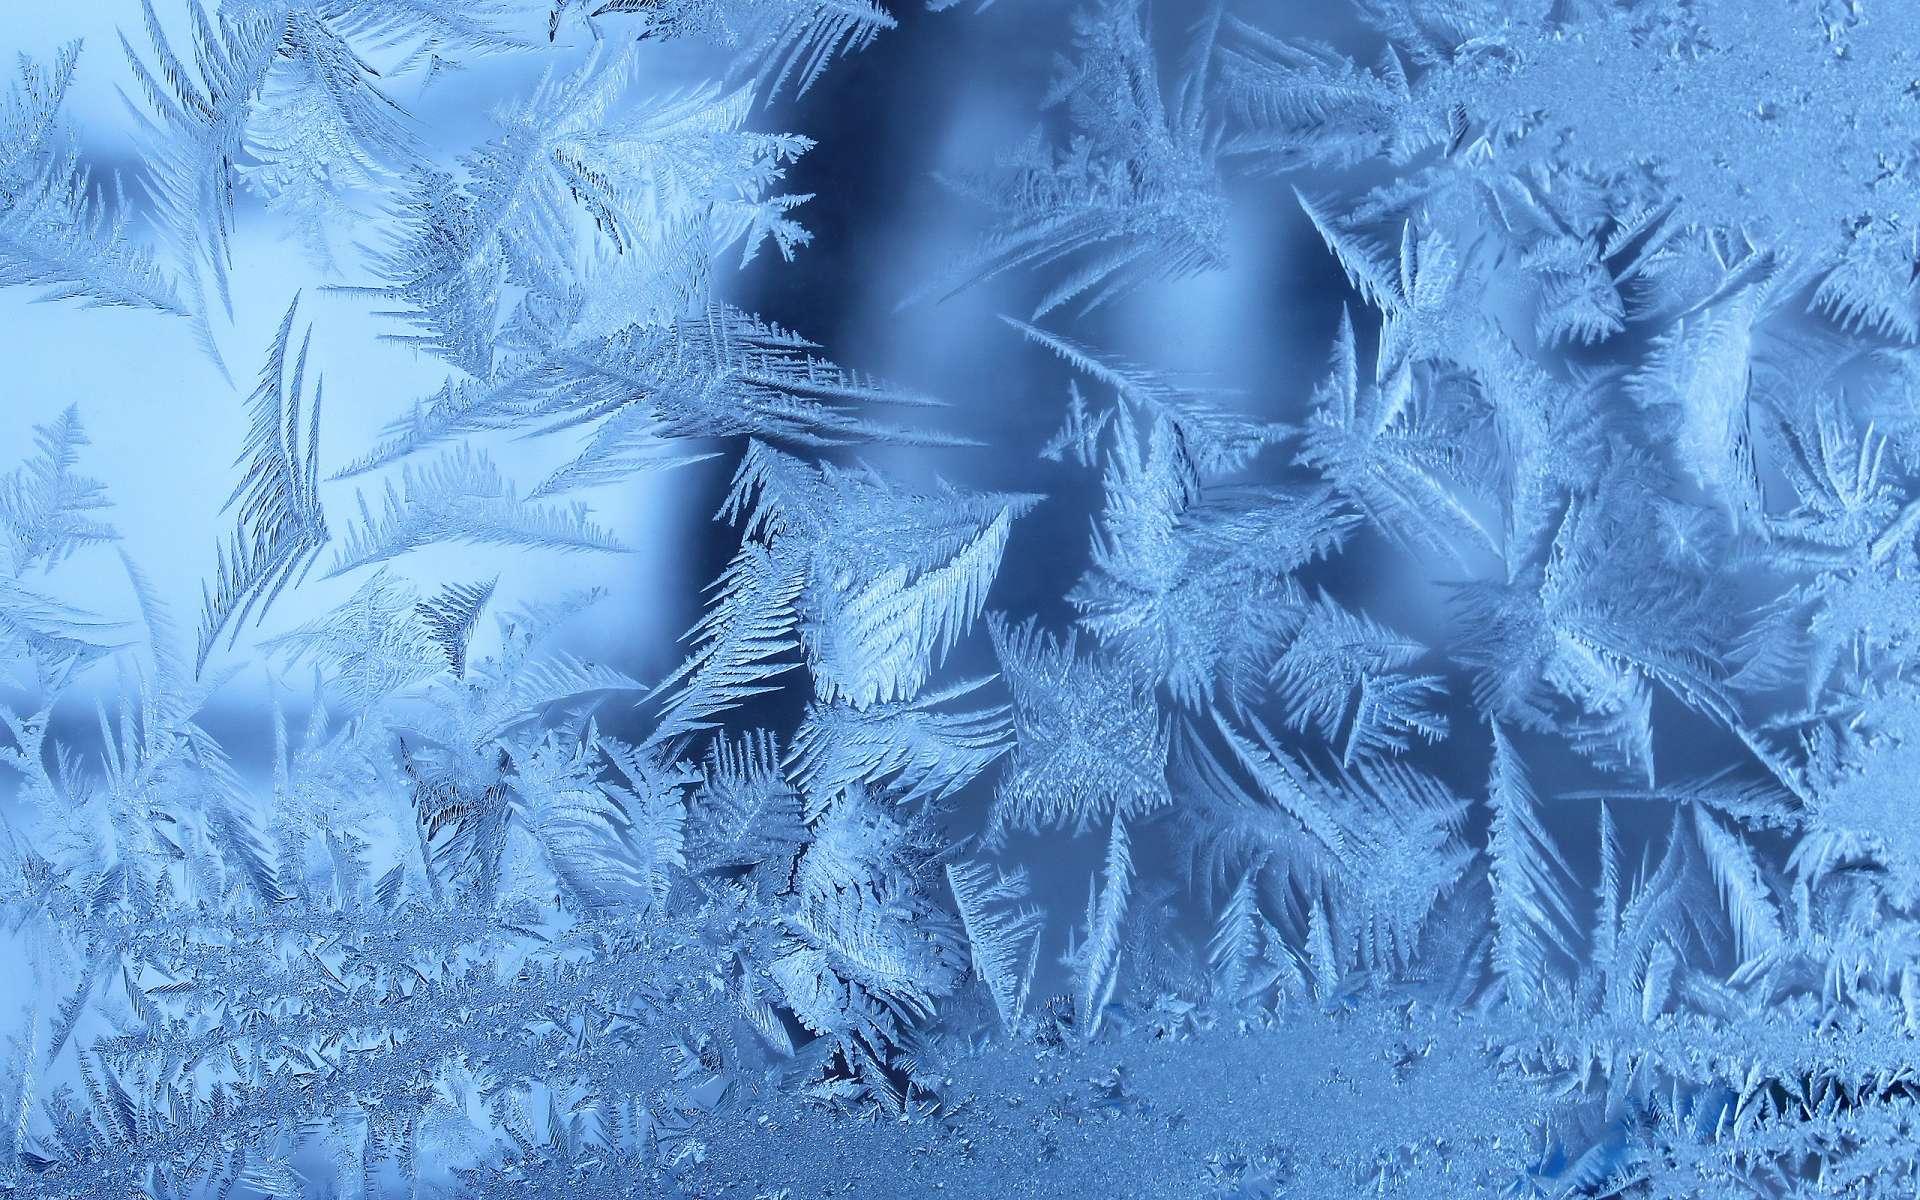 Картинки с морозом и зимой, картинки